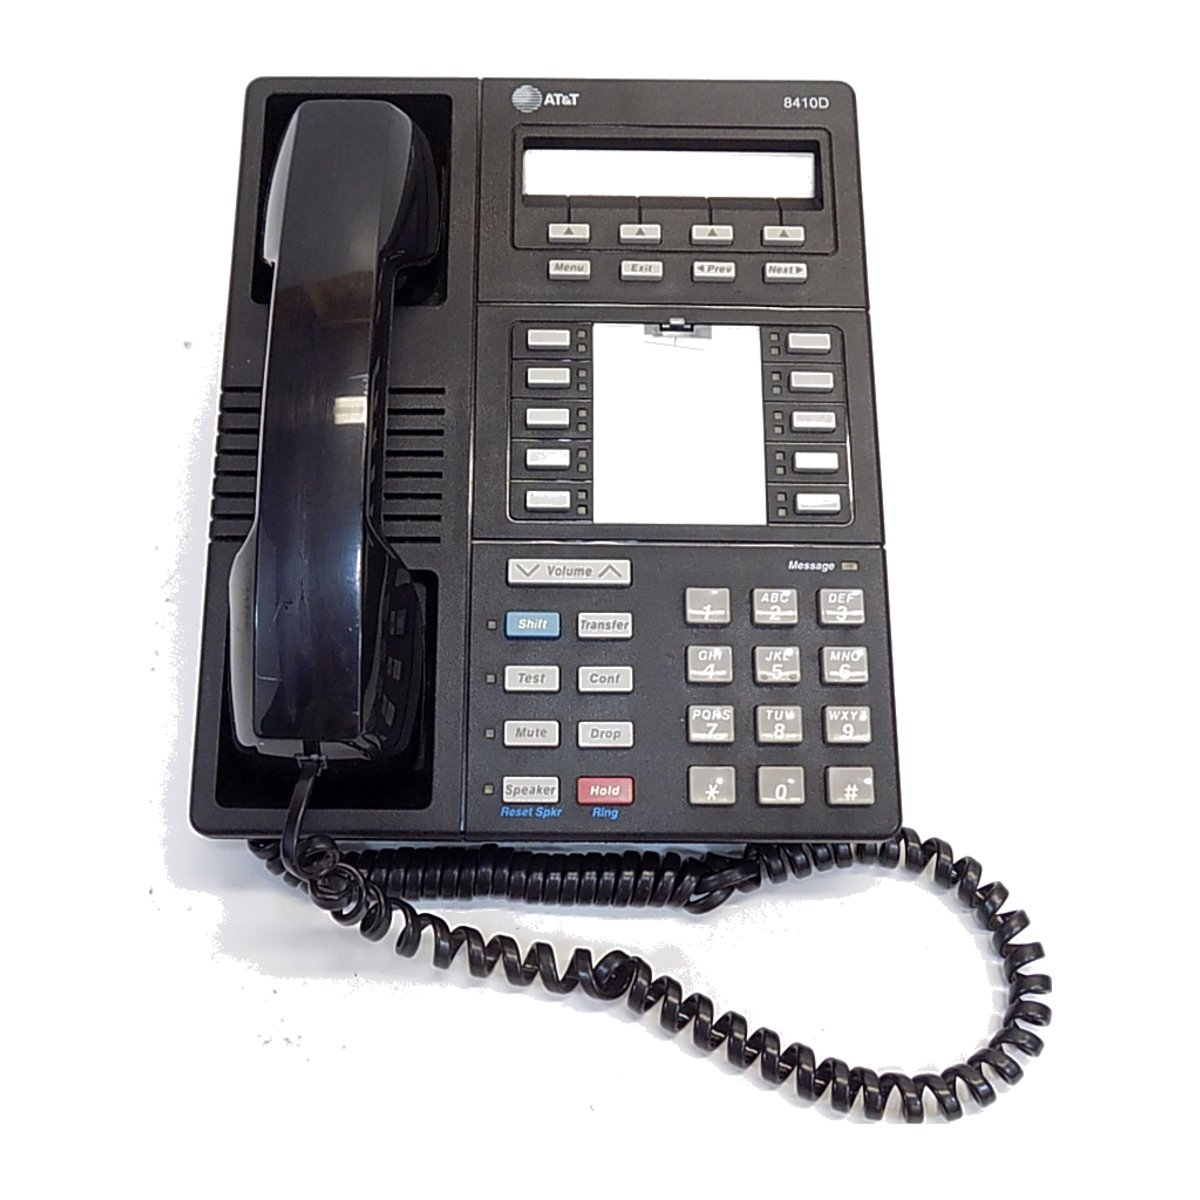 amazon com avaya 8410d phone black pbx telephones and systems rh amazon com AT&T 8410D Phone Avaya 8410D Quick Guide